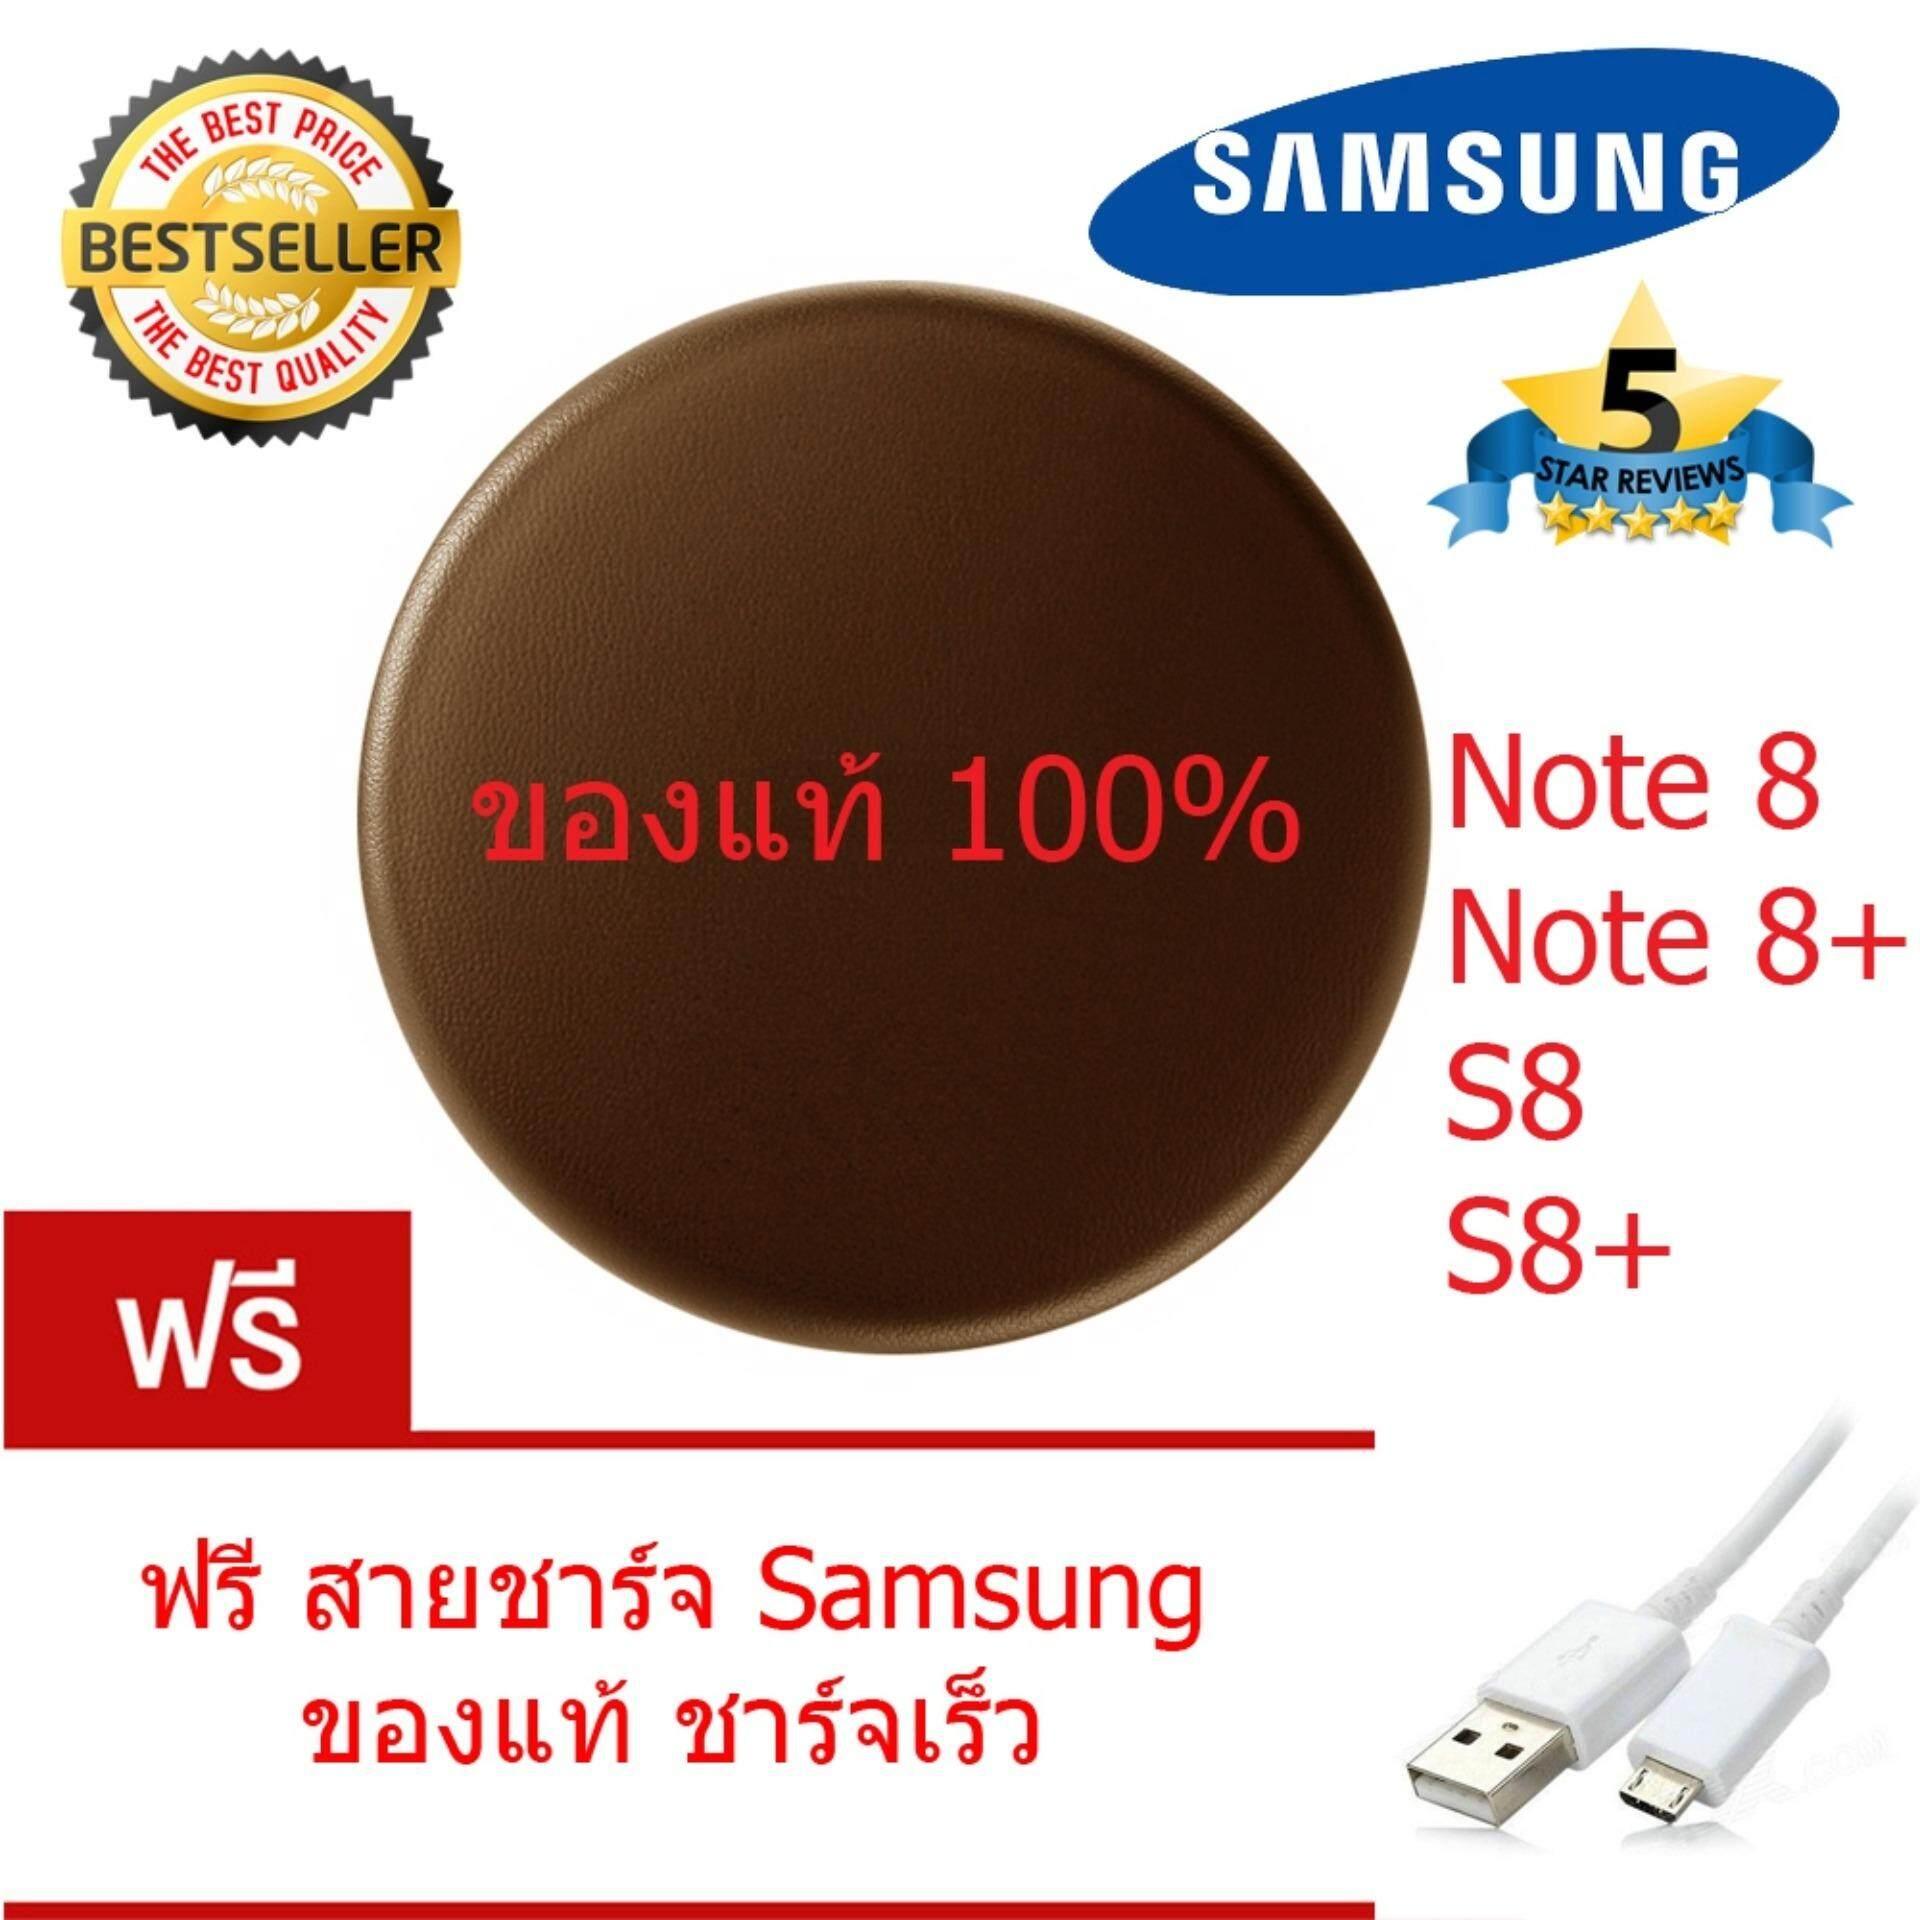 Samsung Wireless Charger Pad ที่ชาร์จไร้สาย คุณภาพสูง For Samsung S8 S8 Edge S8Plus Note 5 S6 Edge Plus S7 S7 Edge ของแท้